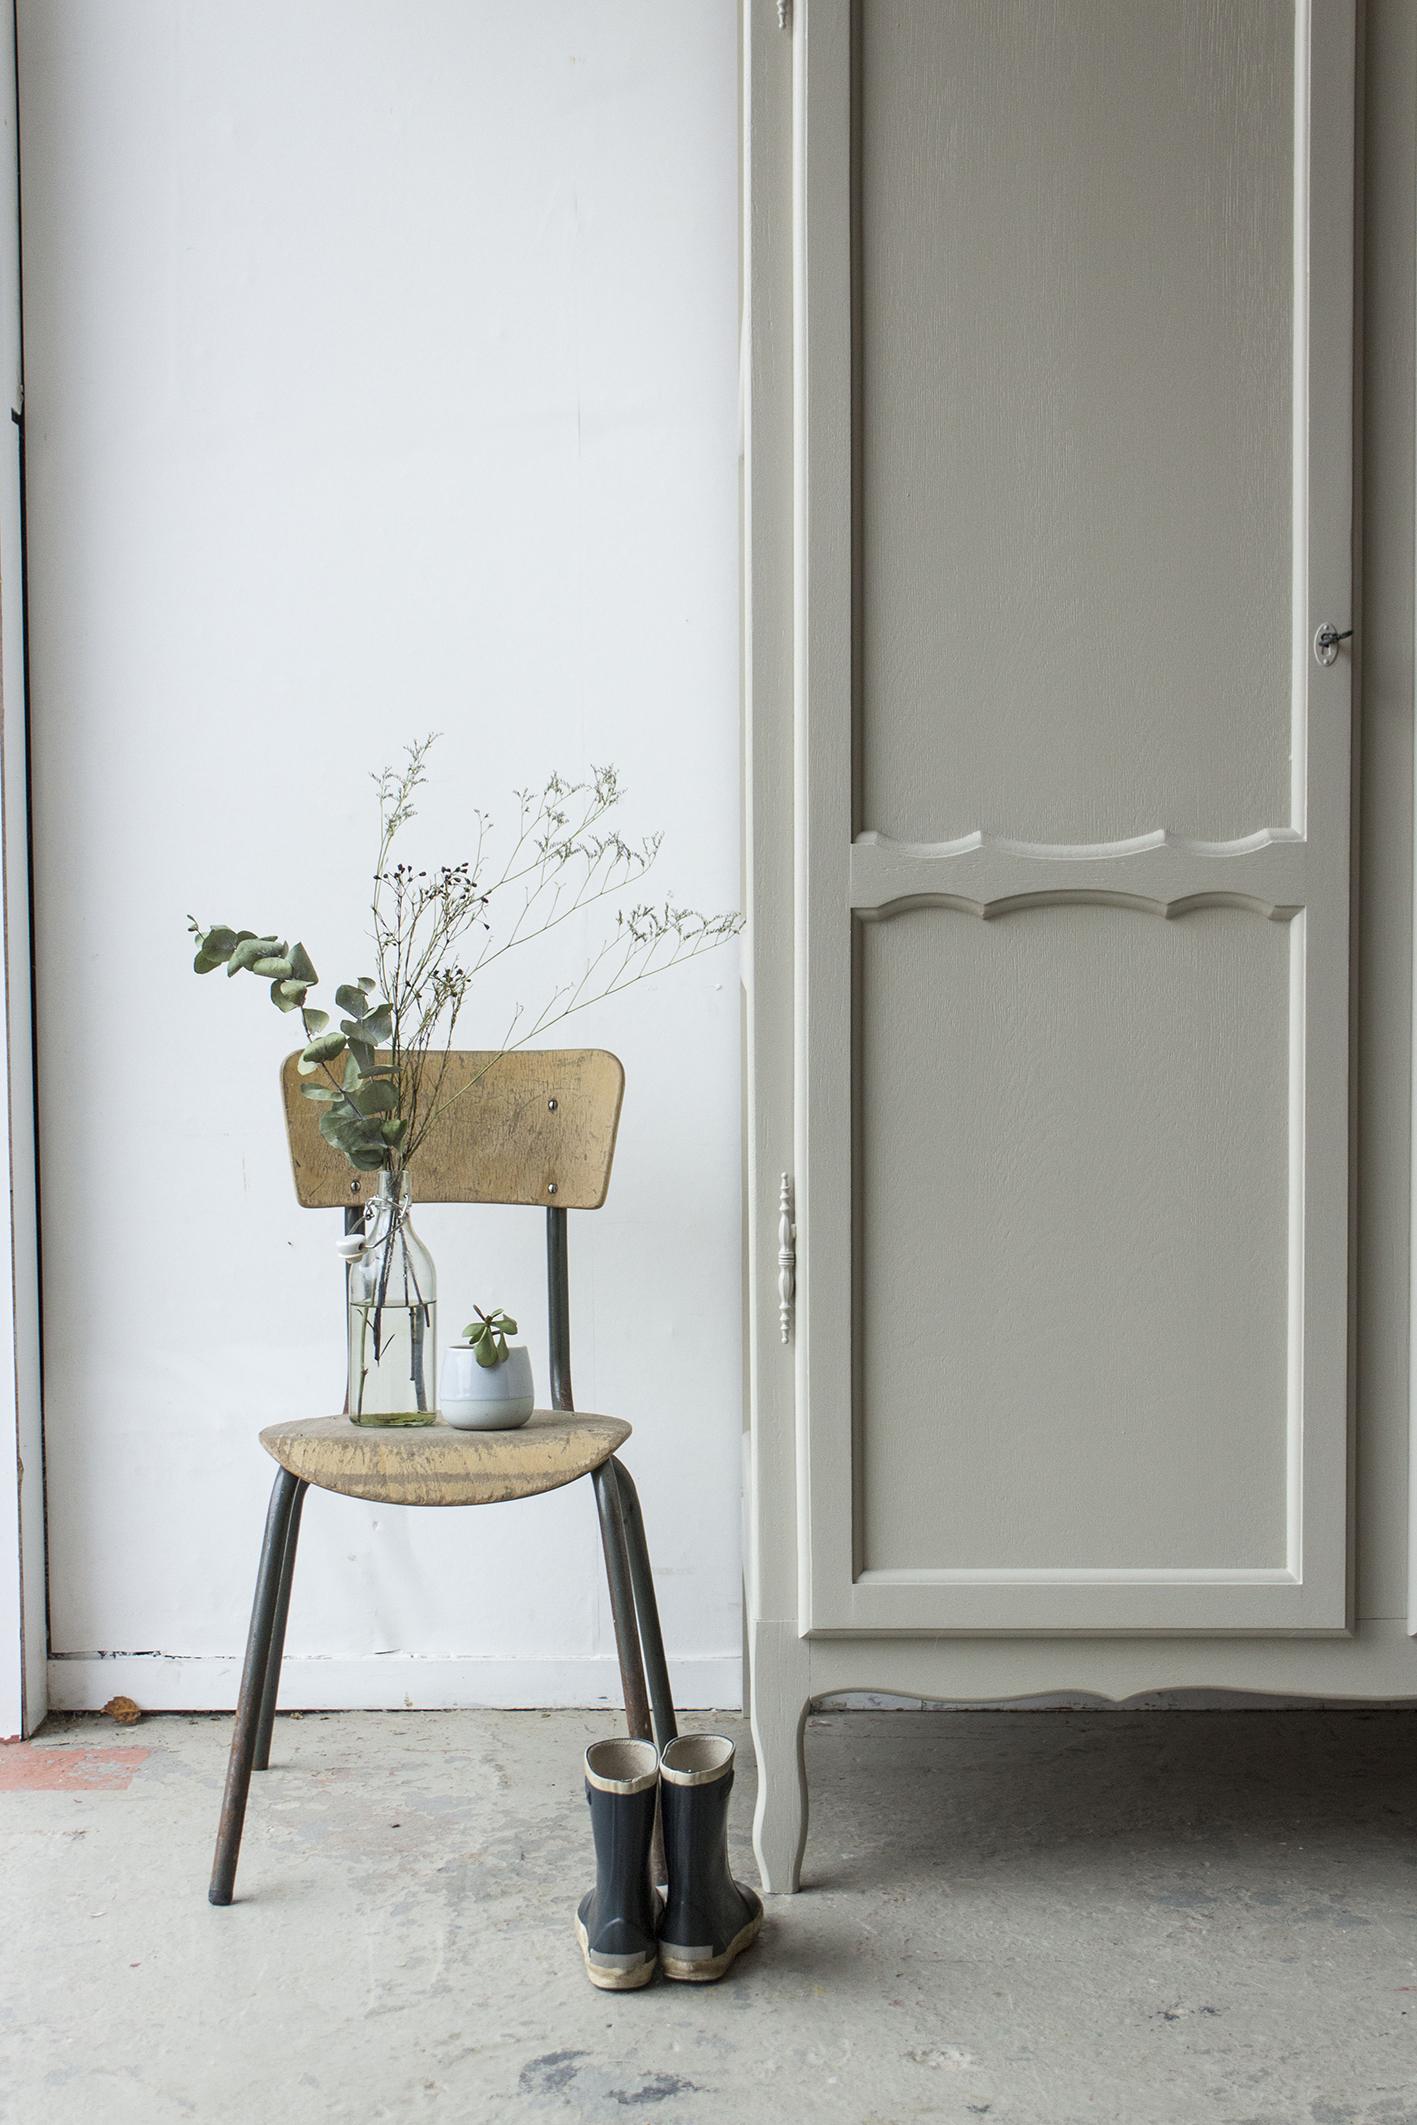 1406- demontabele sierlijke vintage kast in Linnen kleur - Firma zoethout_3.jpg